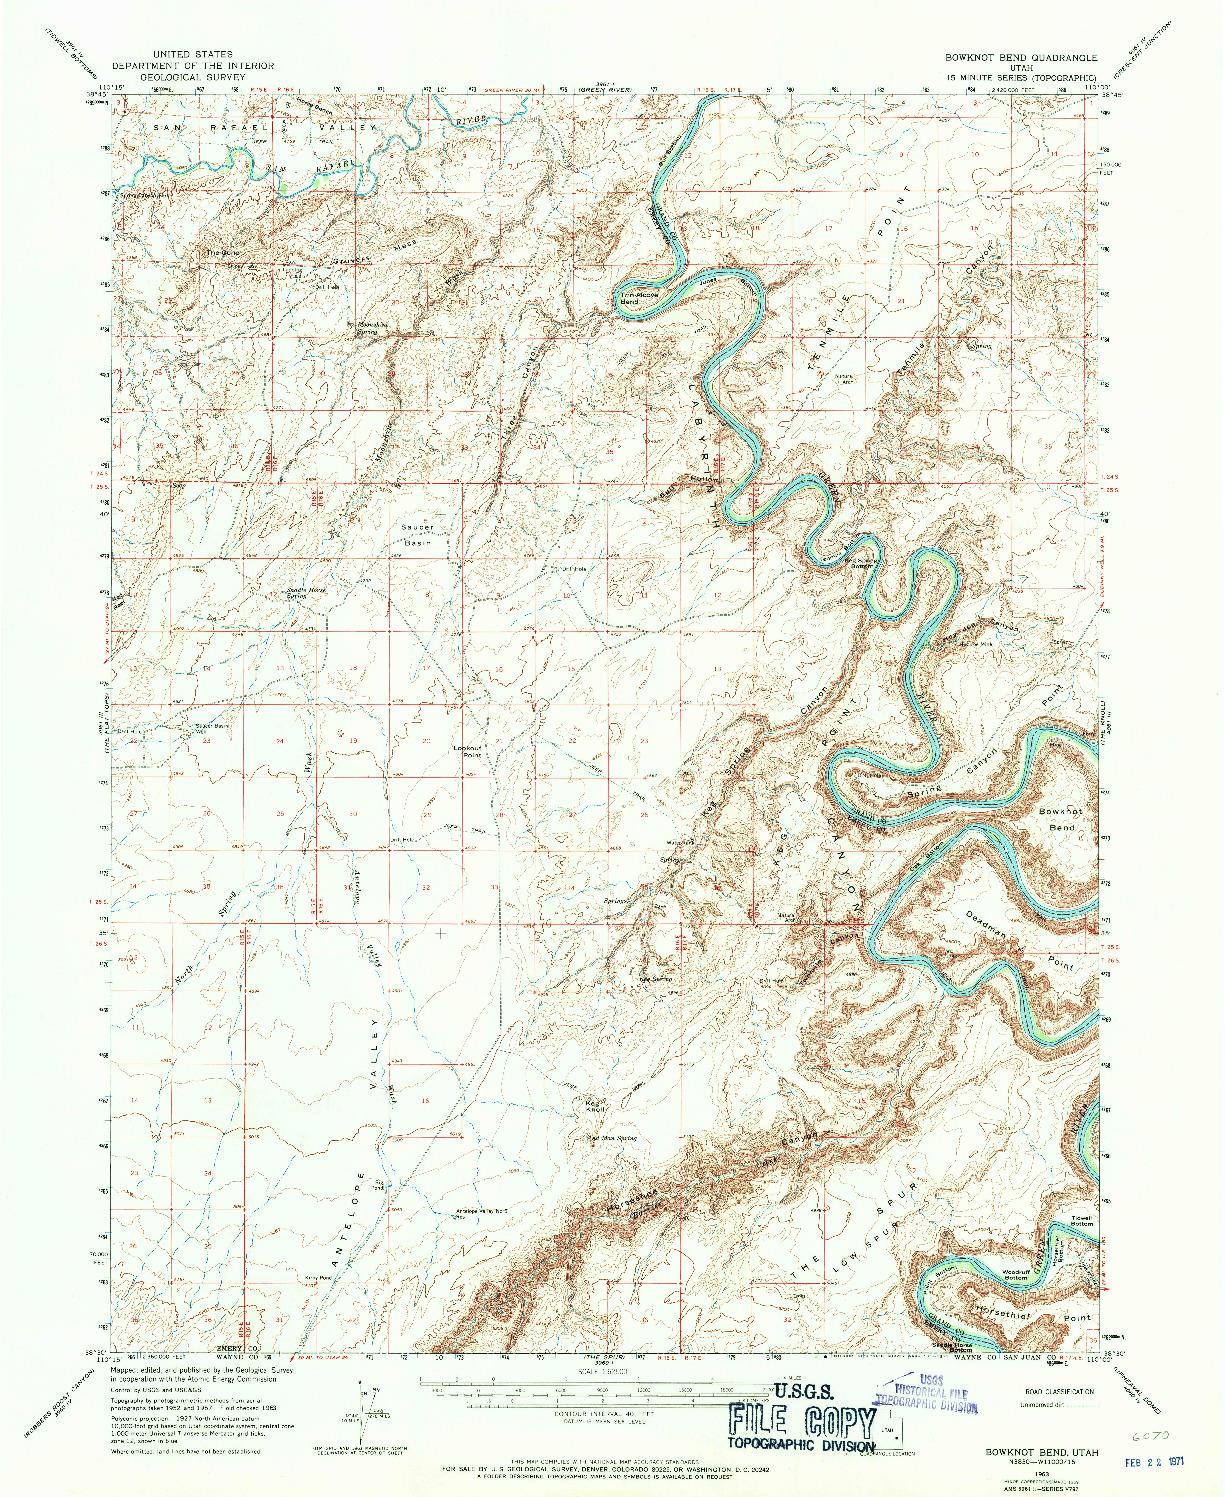 USGS 1:62500-SCALE QUADRANGLE FOR BOWKNOT BEND, UT 1963